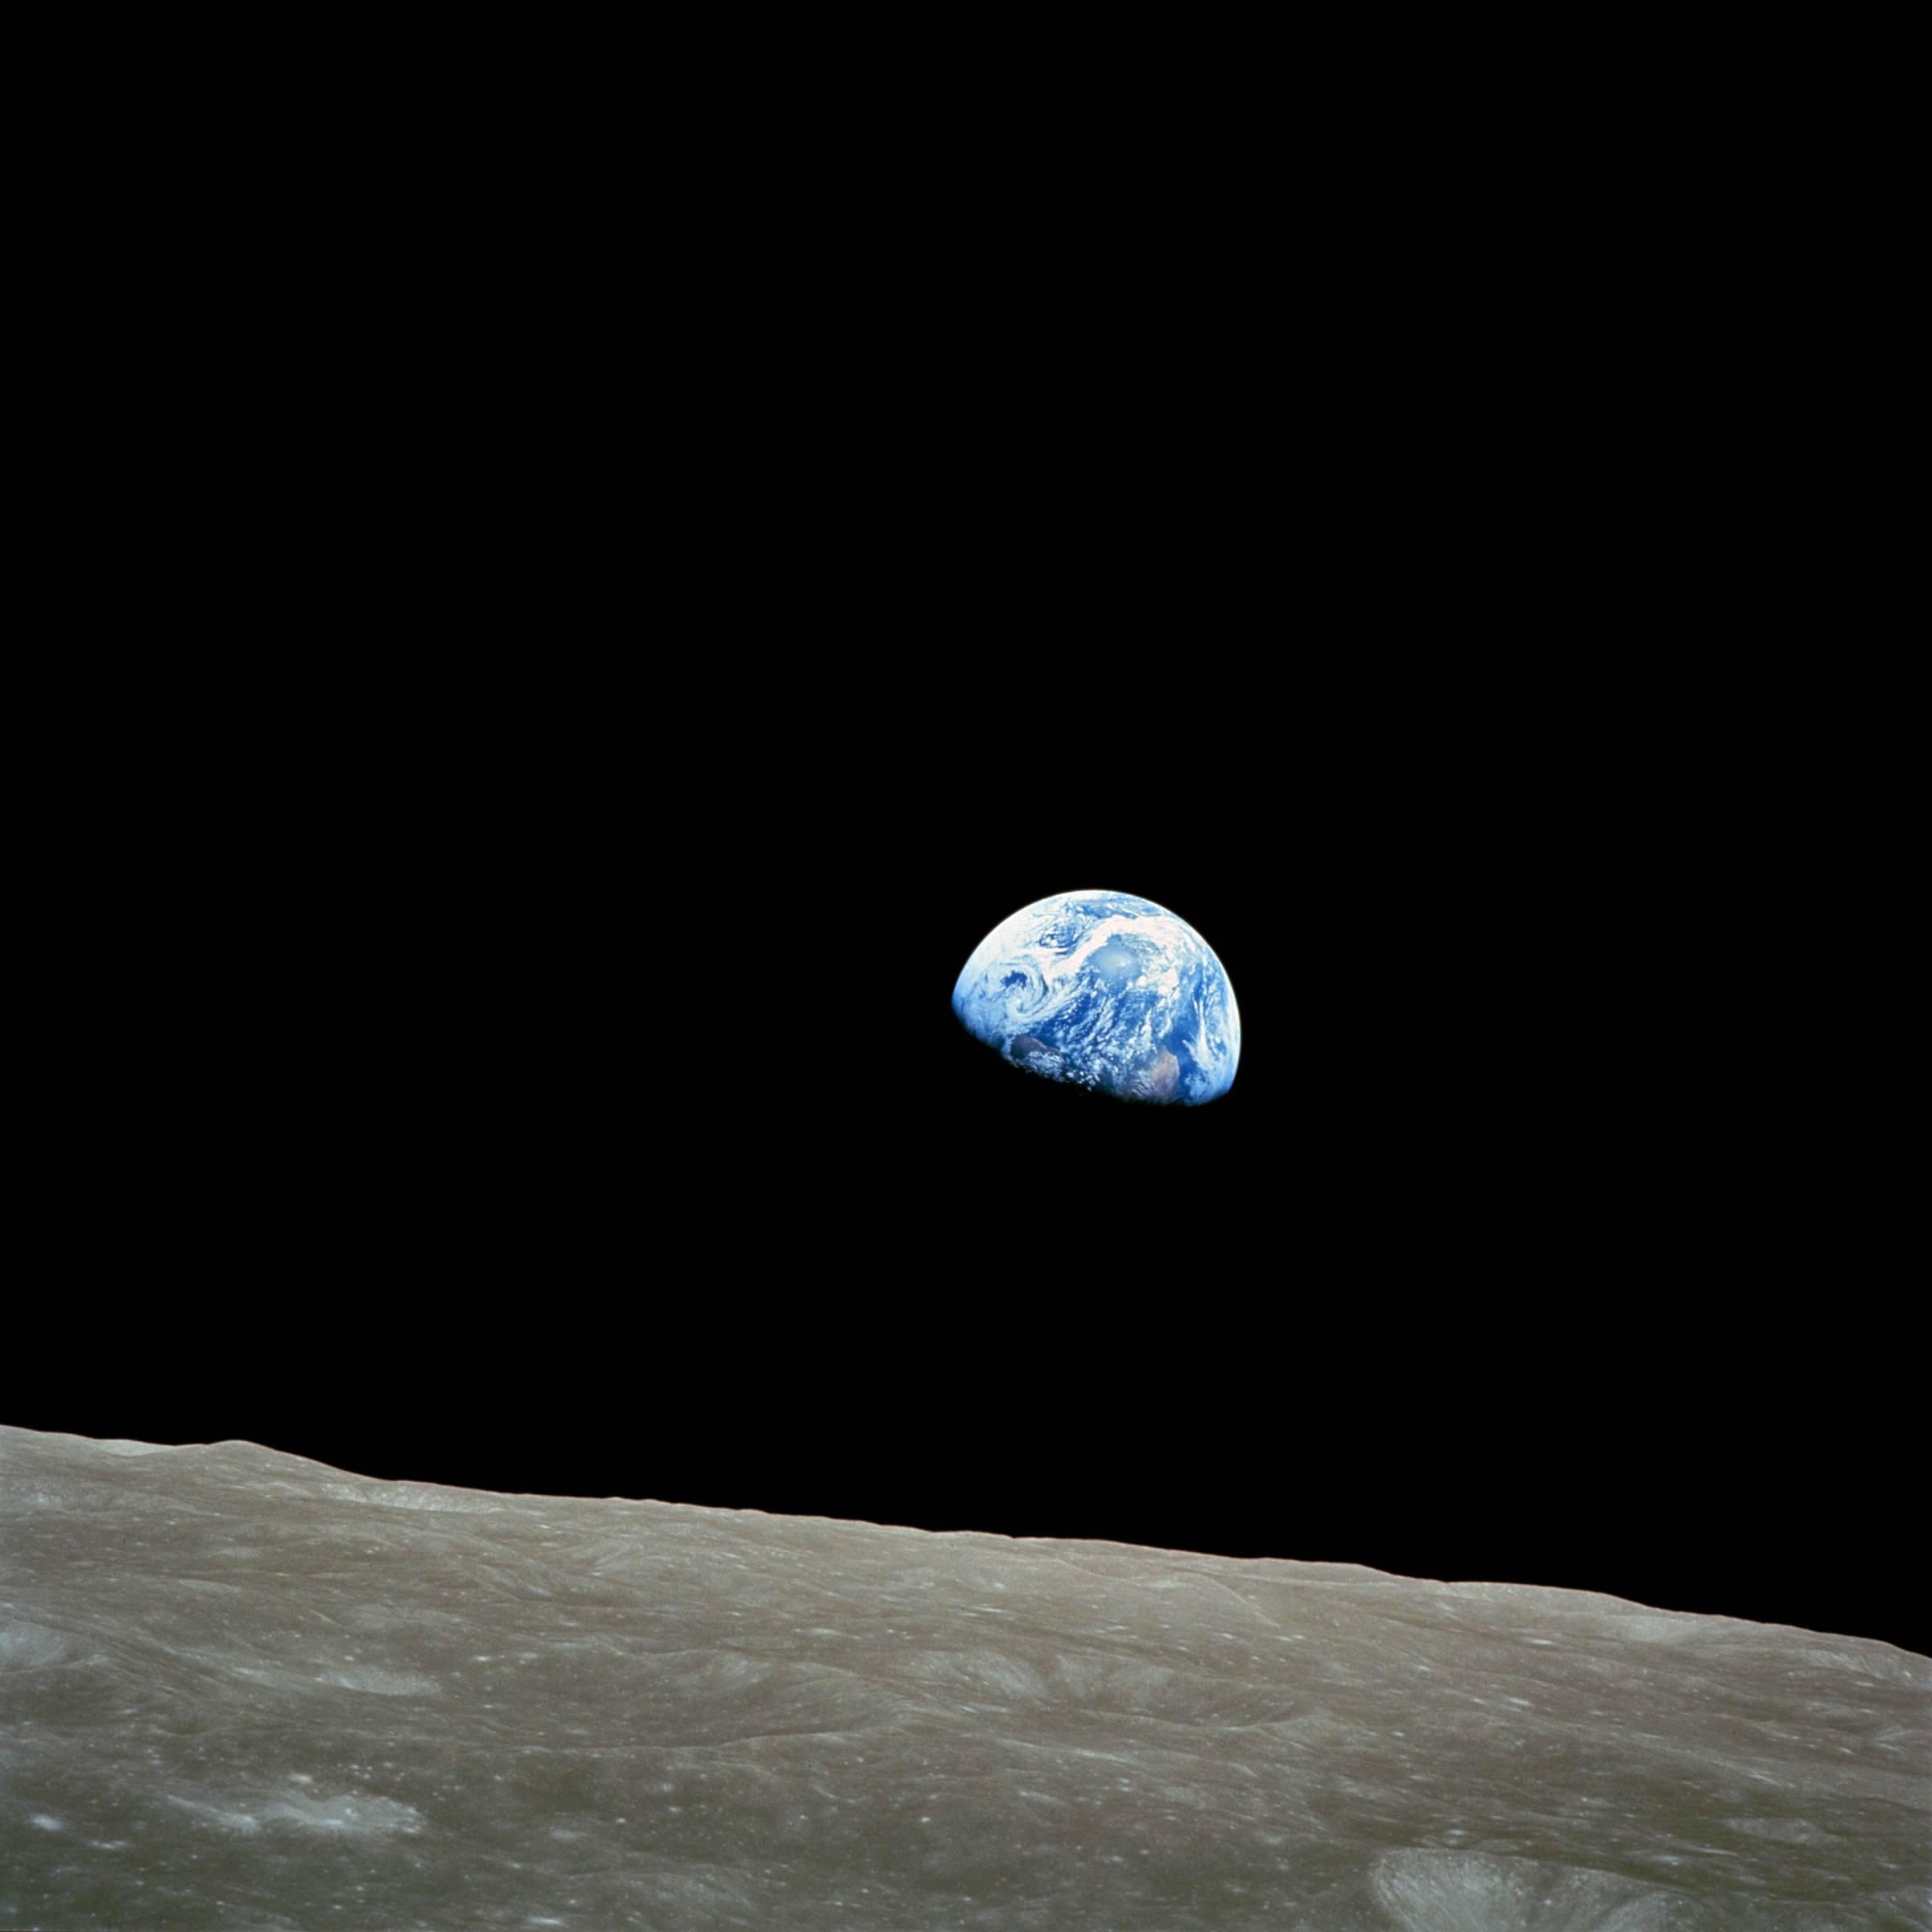 Masih percaya jika Bumi itu Datar? Ini fakta sederhana yang kita temui sehari-hari